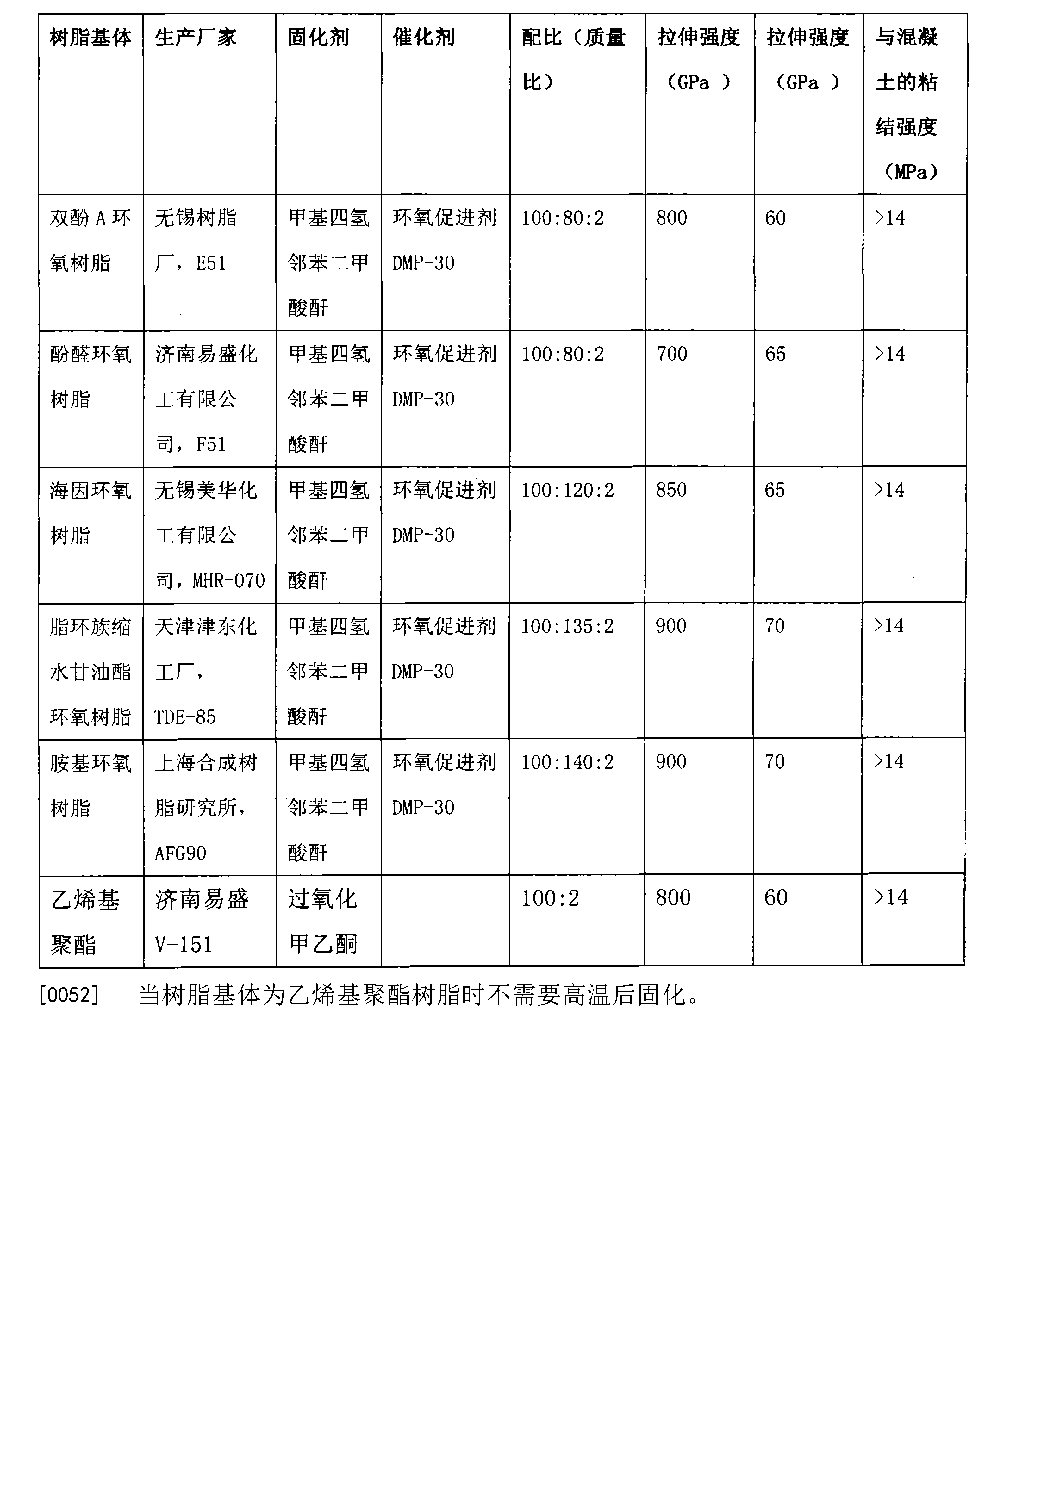 CN103225369B - A surface having a fiber composite